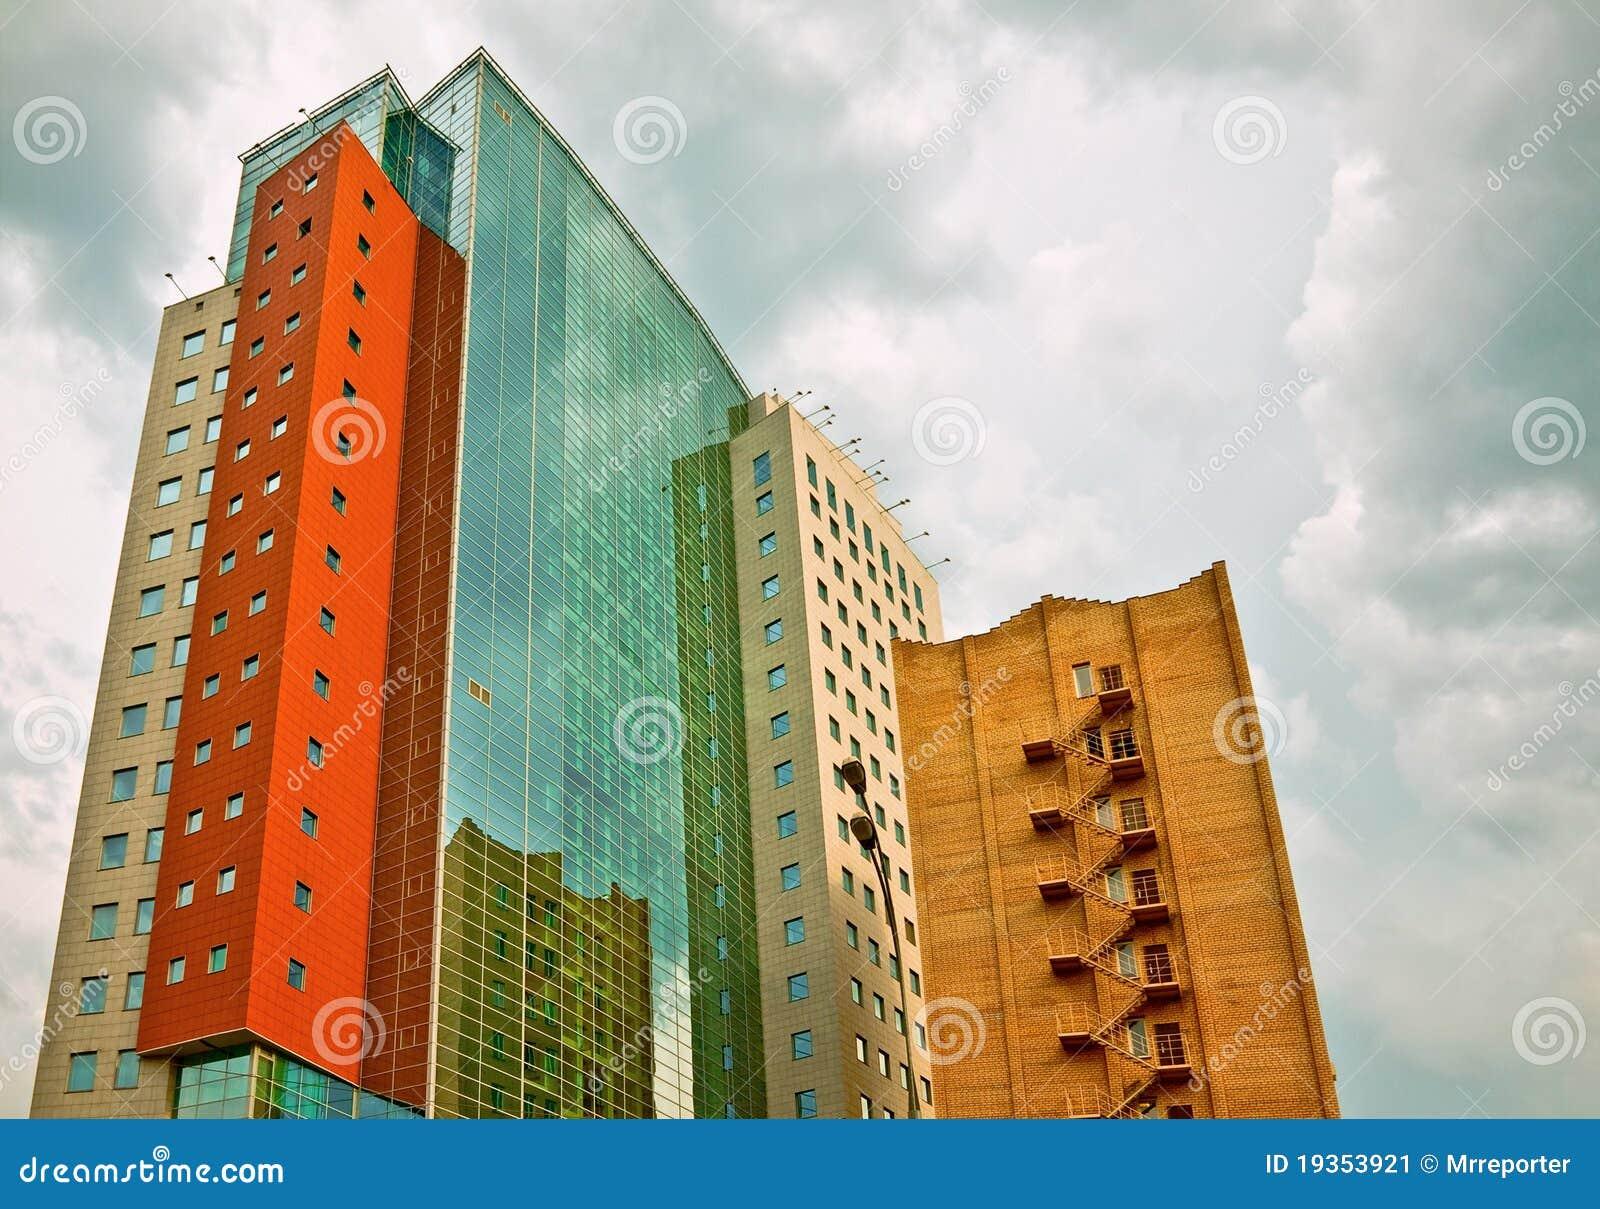 Mistura arquitectónica